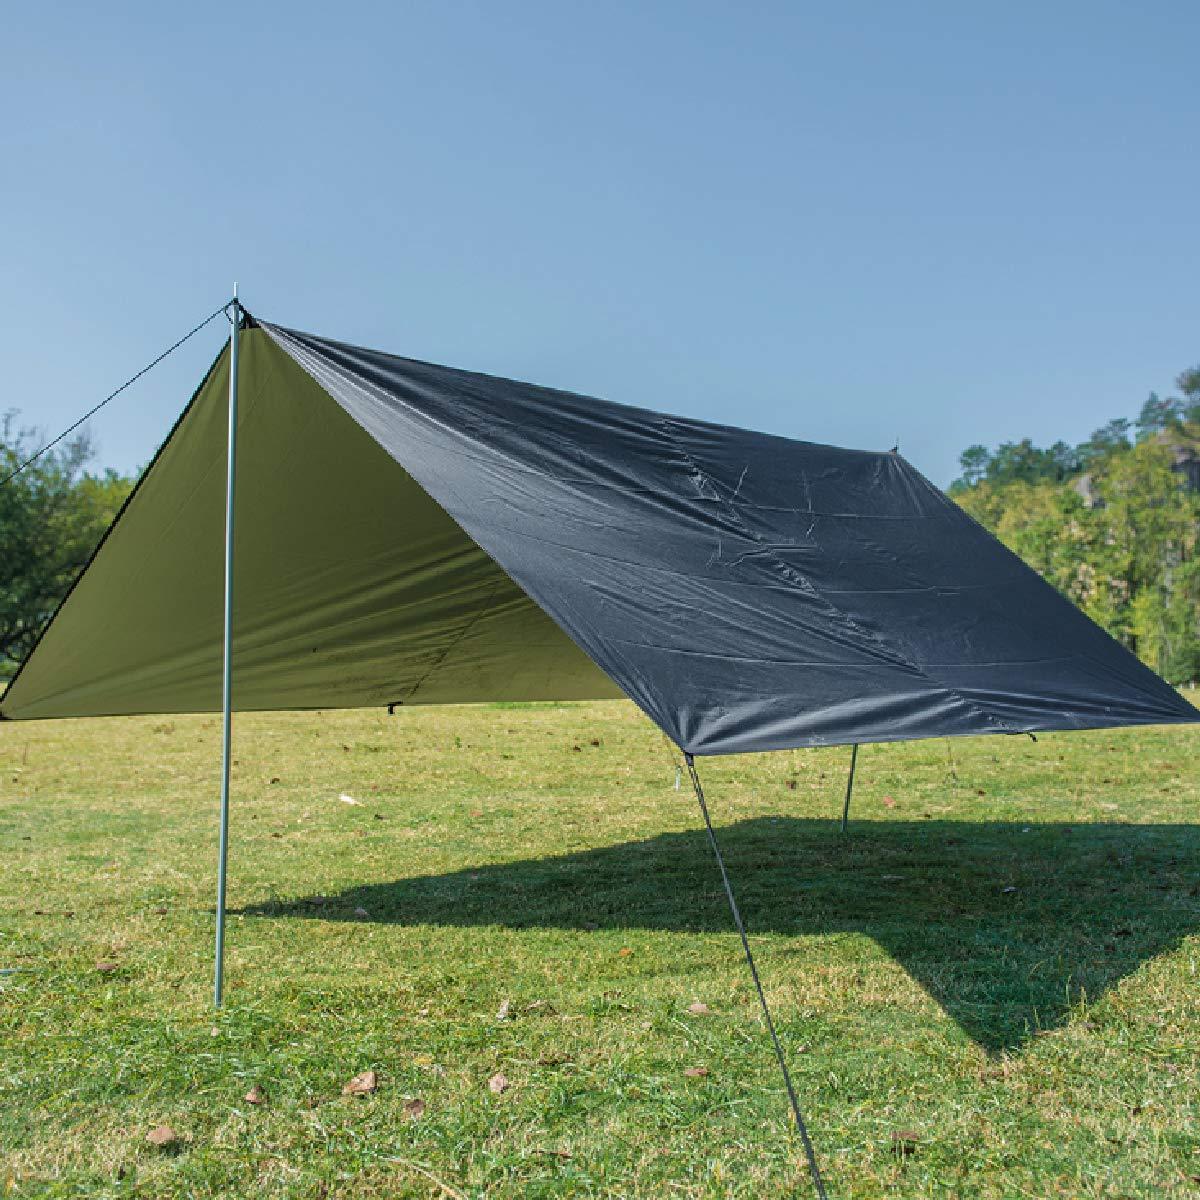 TRIWONDER Telo Tenda Tarp Targhetta Amaca Impermeabile Rain Fly Camping Tarp Impronta della Tenda 118 x118 Telo per Canopy Hammock Picnic